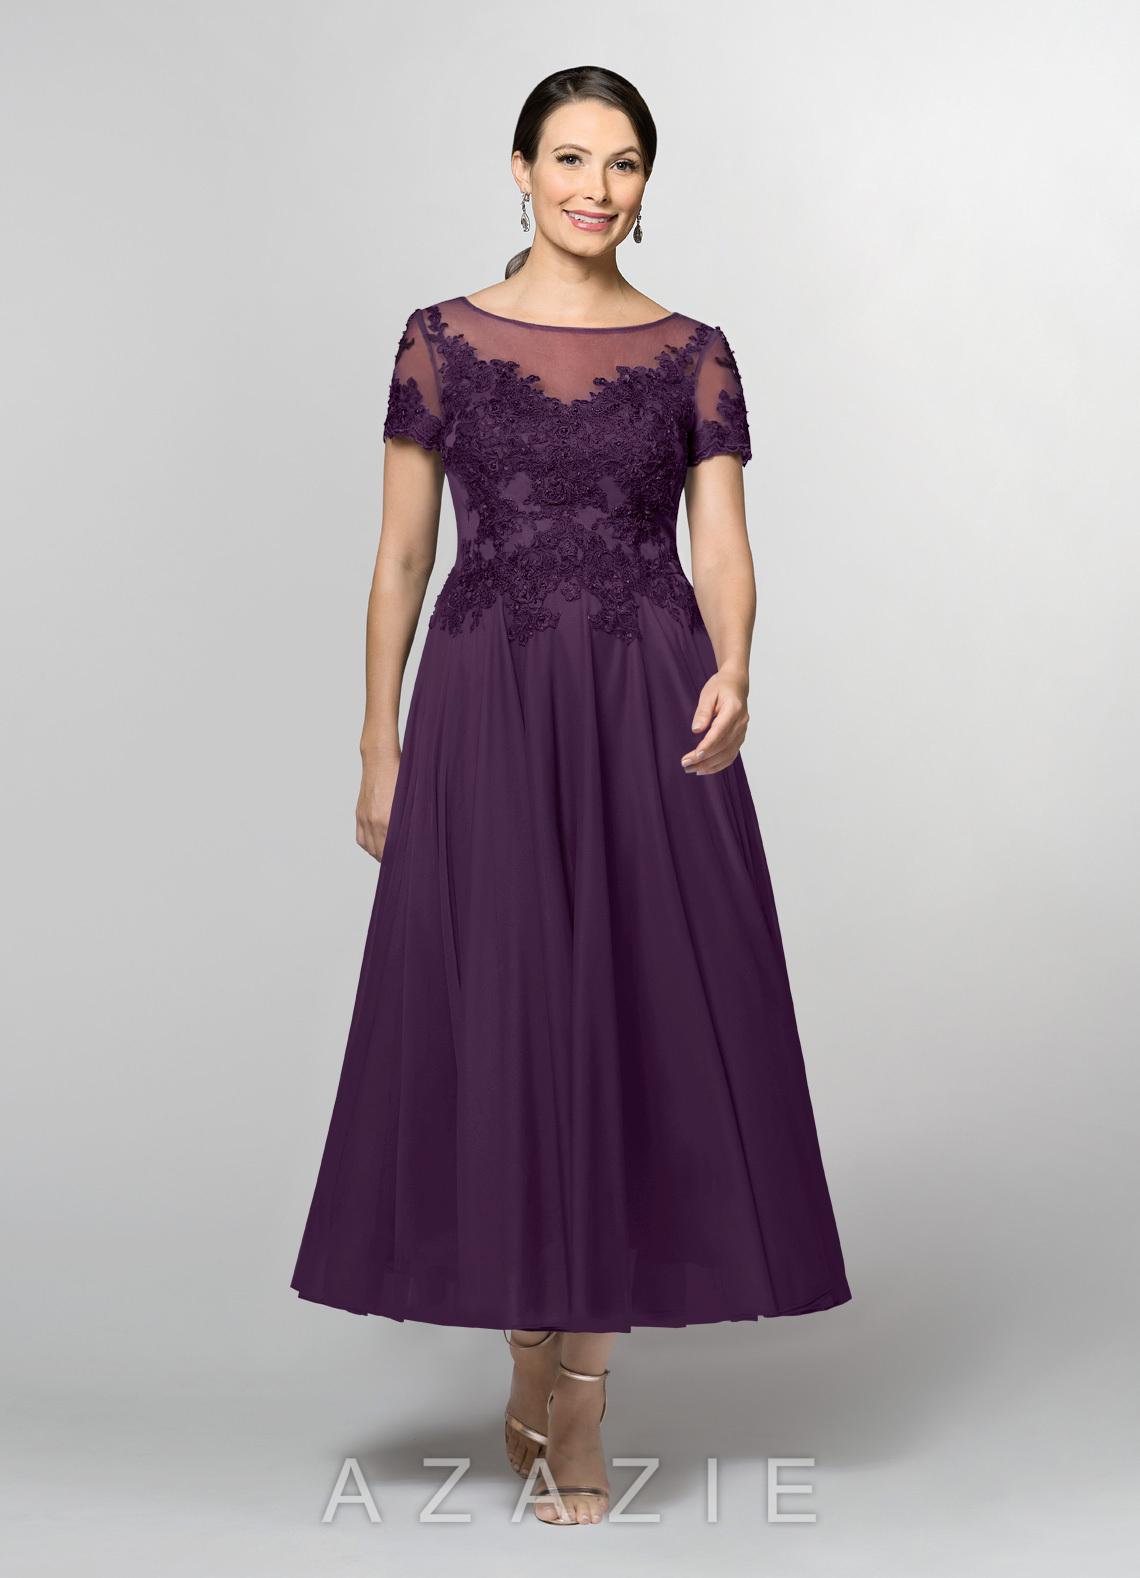 7b958ac431 Azazie Liliane MBD Mother Of The Bride Dress